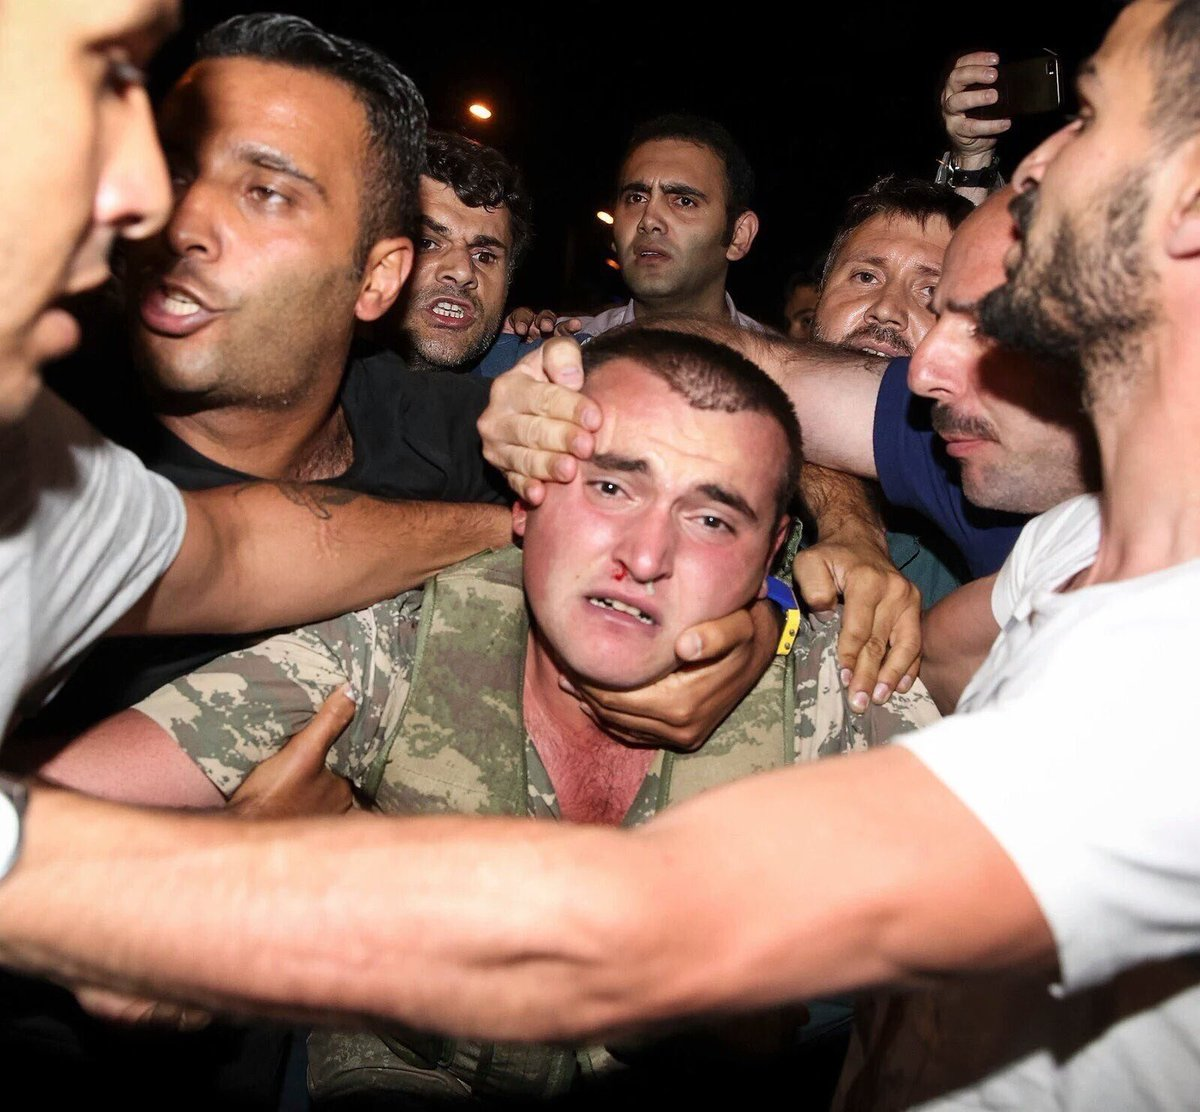 """Not on our watch!"" #فشل_الانقلاب_في_تركيا https://t.co/LoUSHyx3Oz"